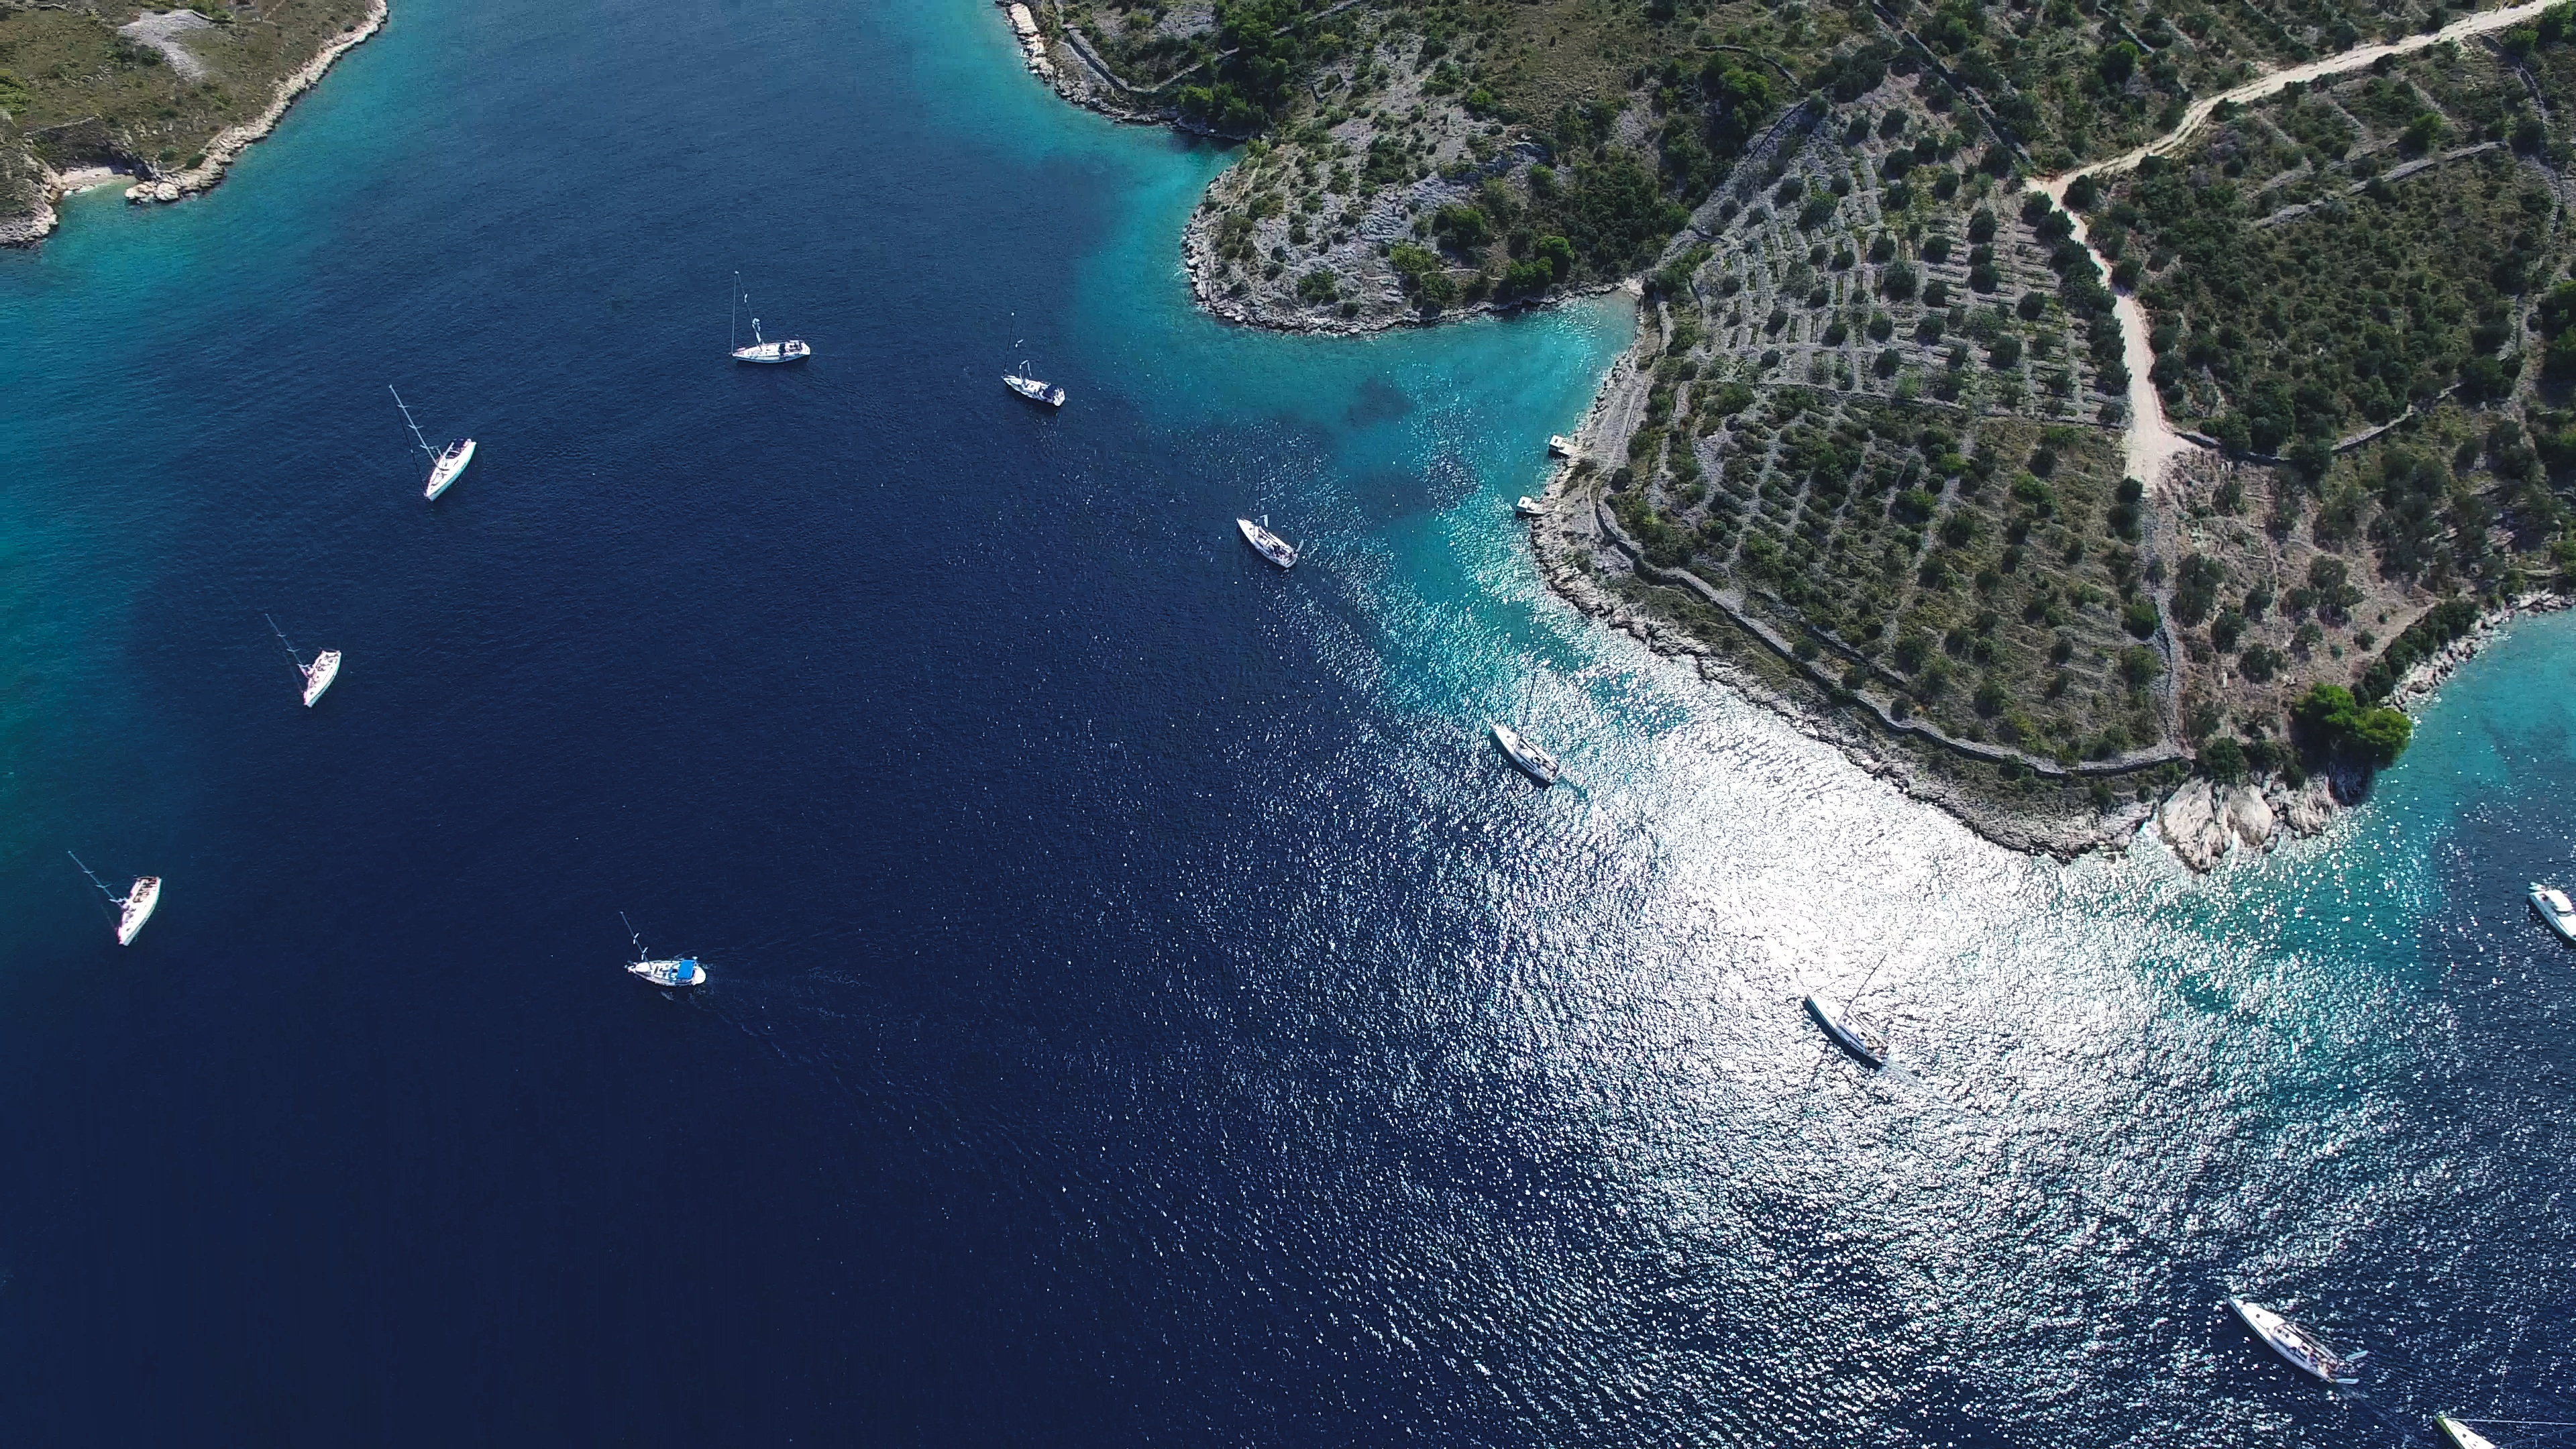 Free stock photo of sea, bird's eye view, beach, vacation